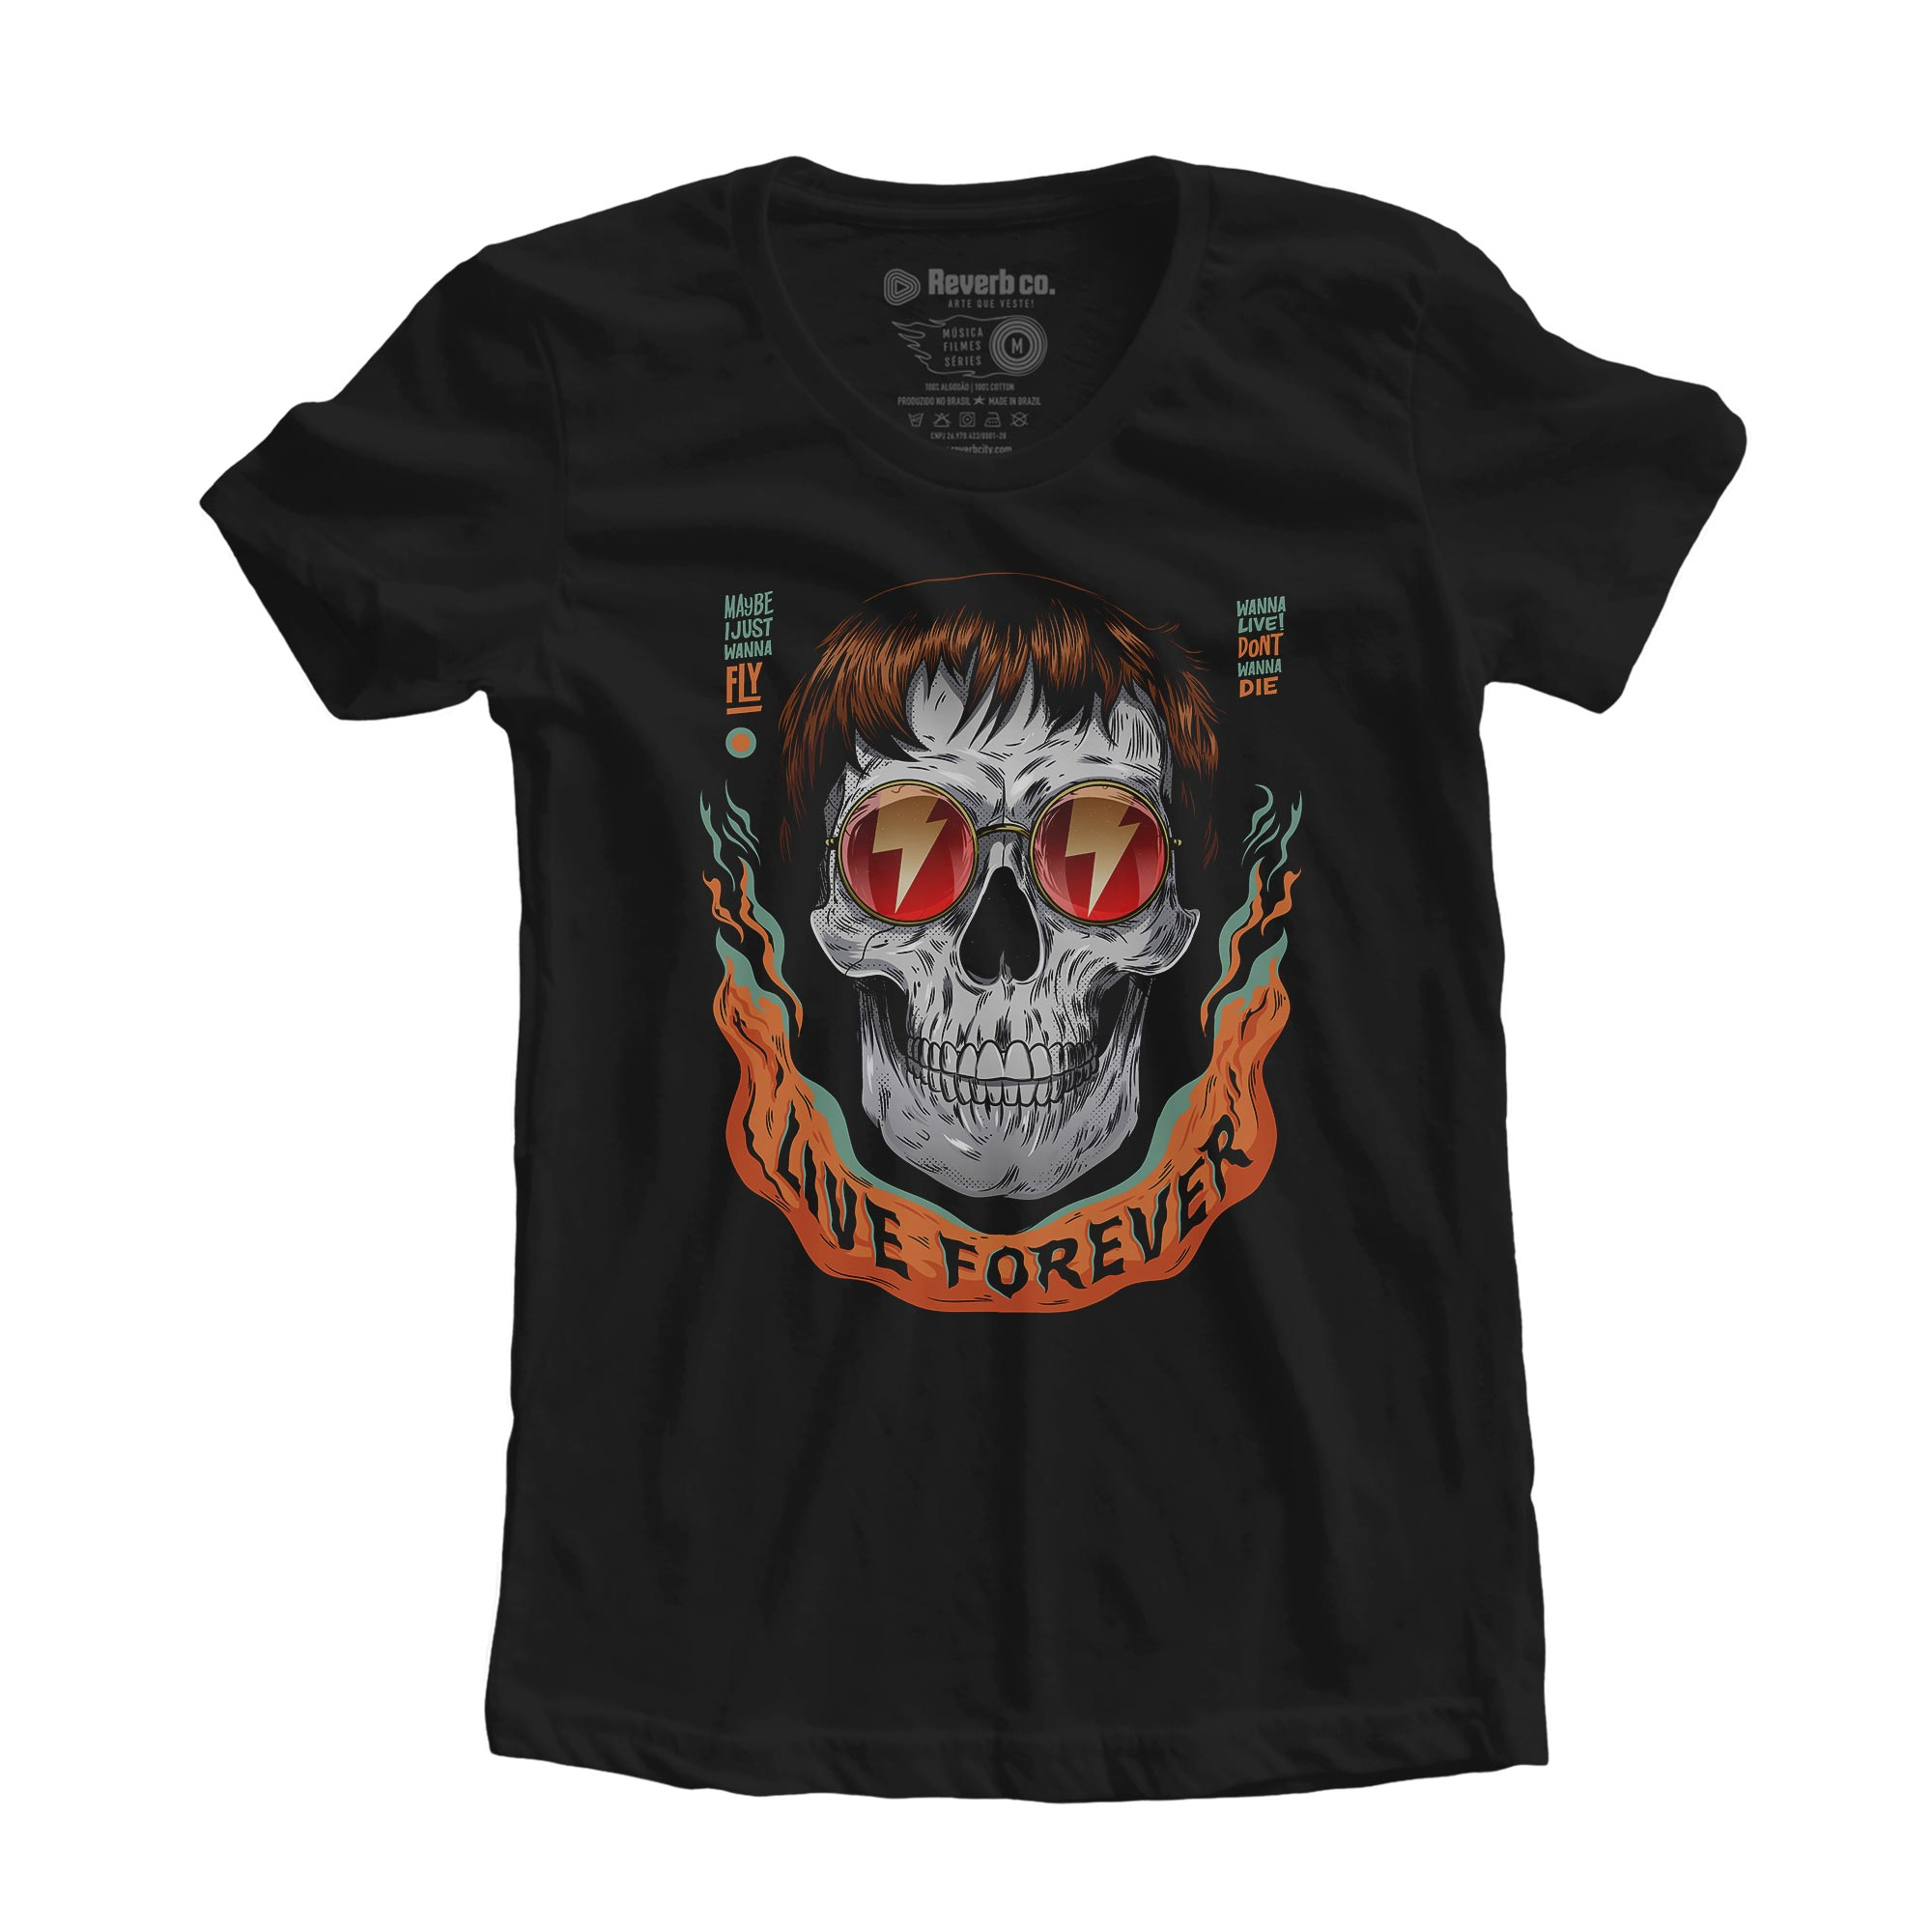 Camiseta Caveira Live Forever - Feminino